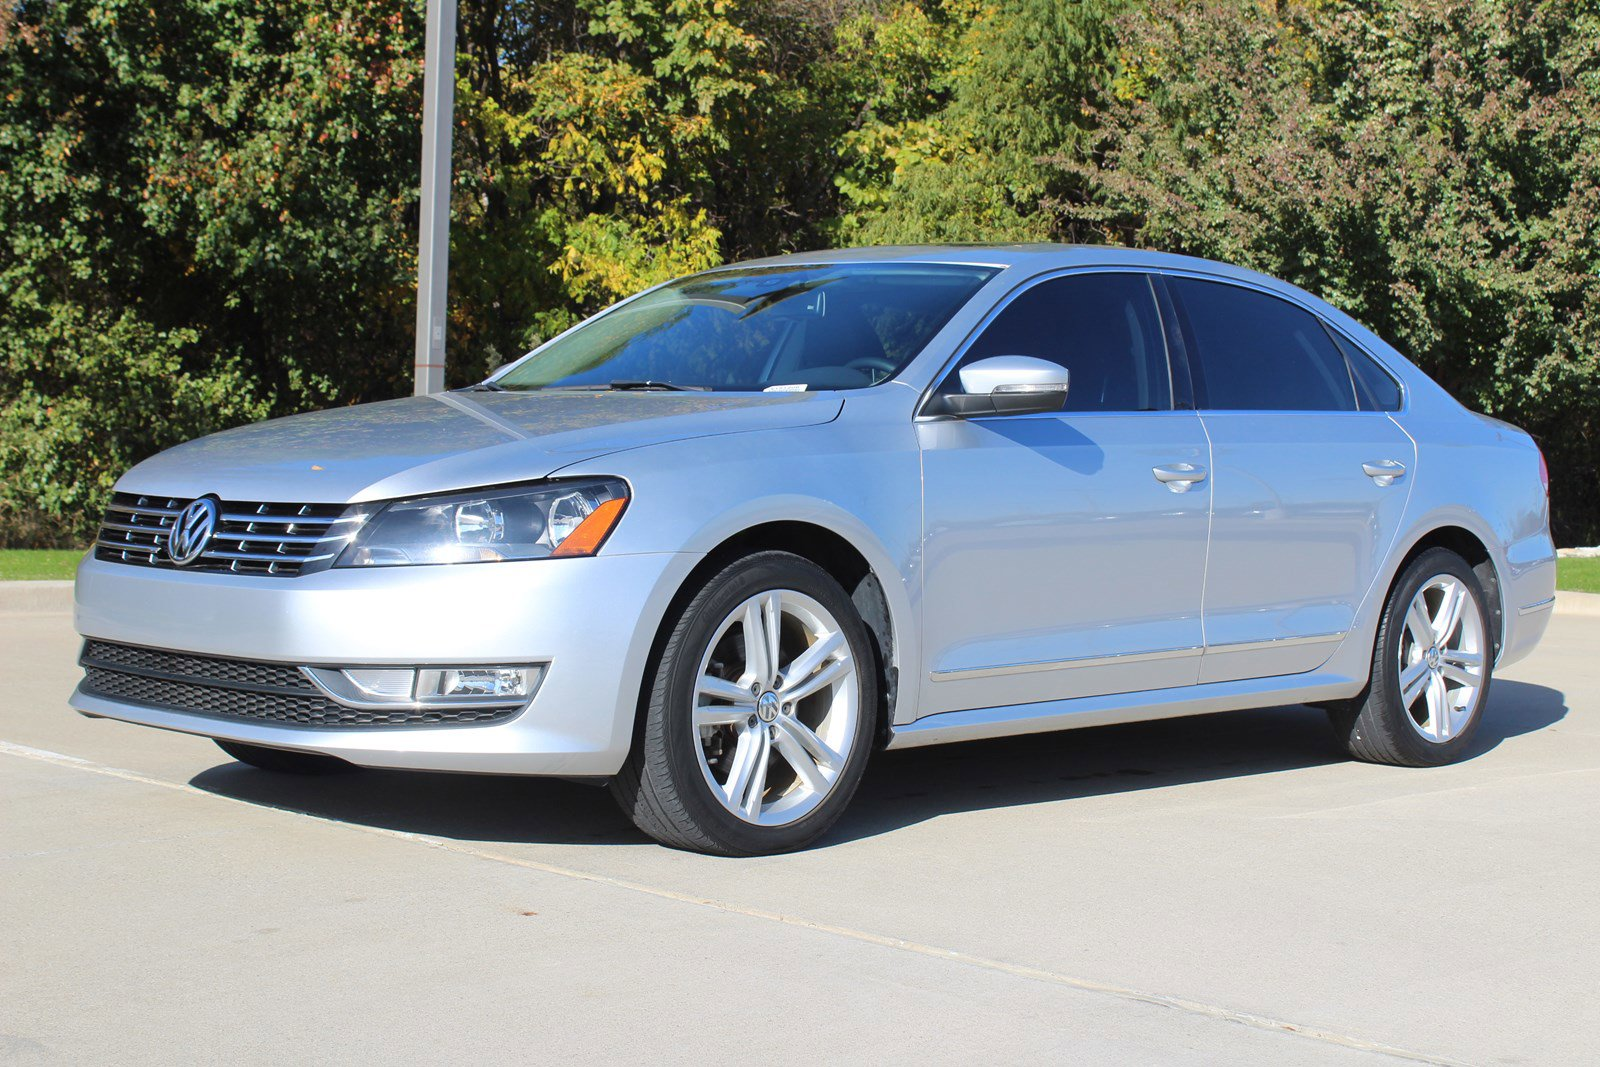 Pre-Owned 2013 Volkswagen Passat TDI SEL Premium